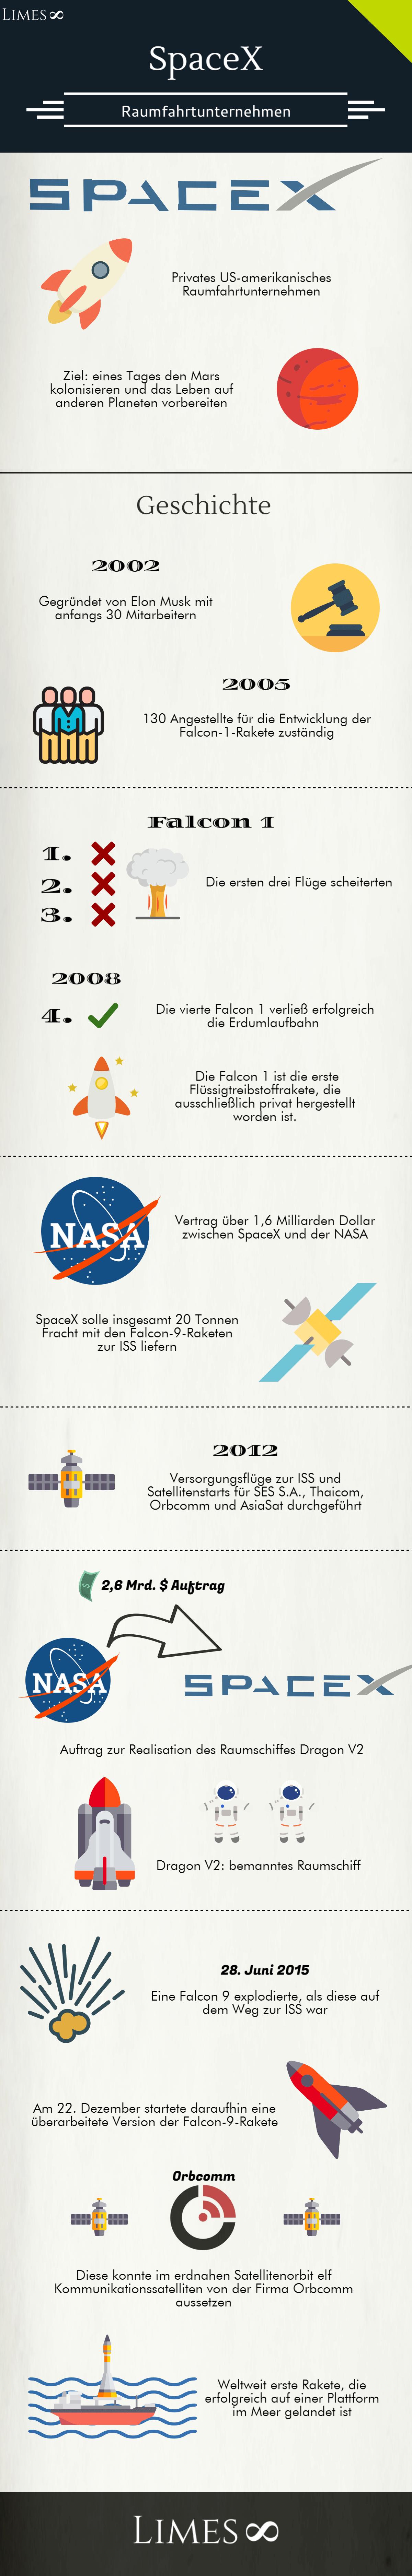 Infografik über SpaceX